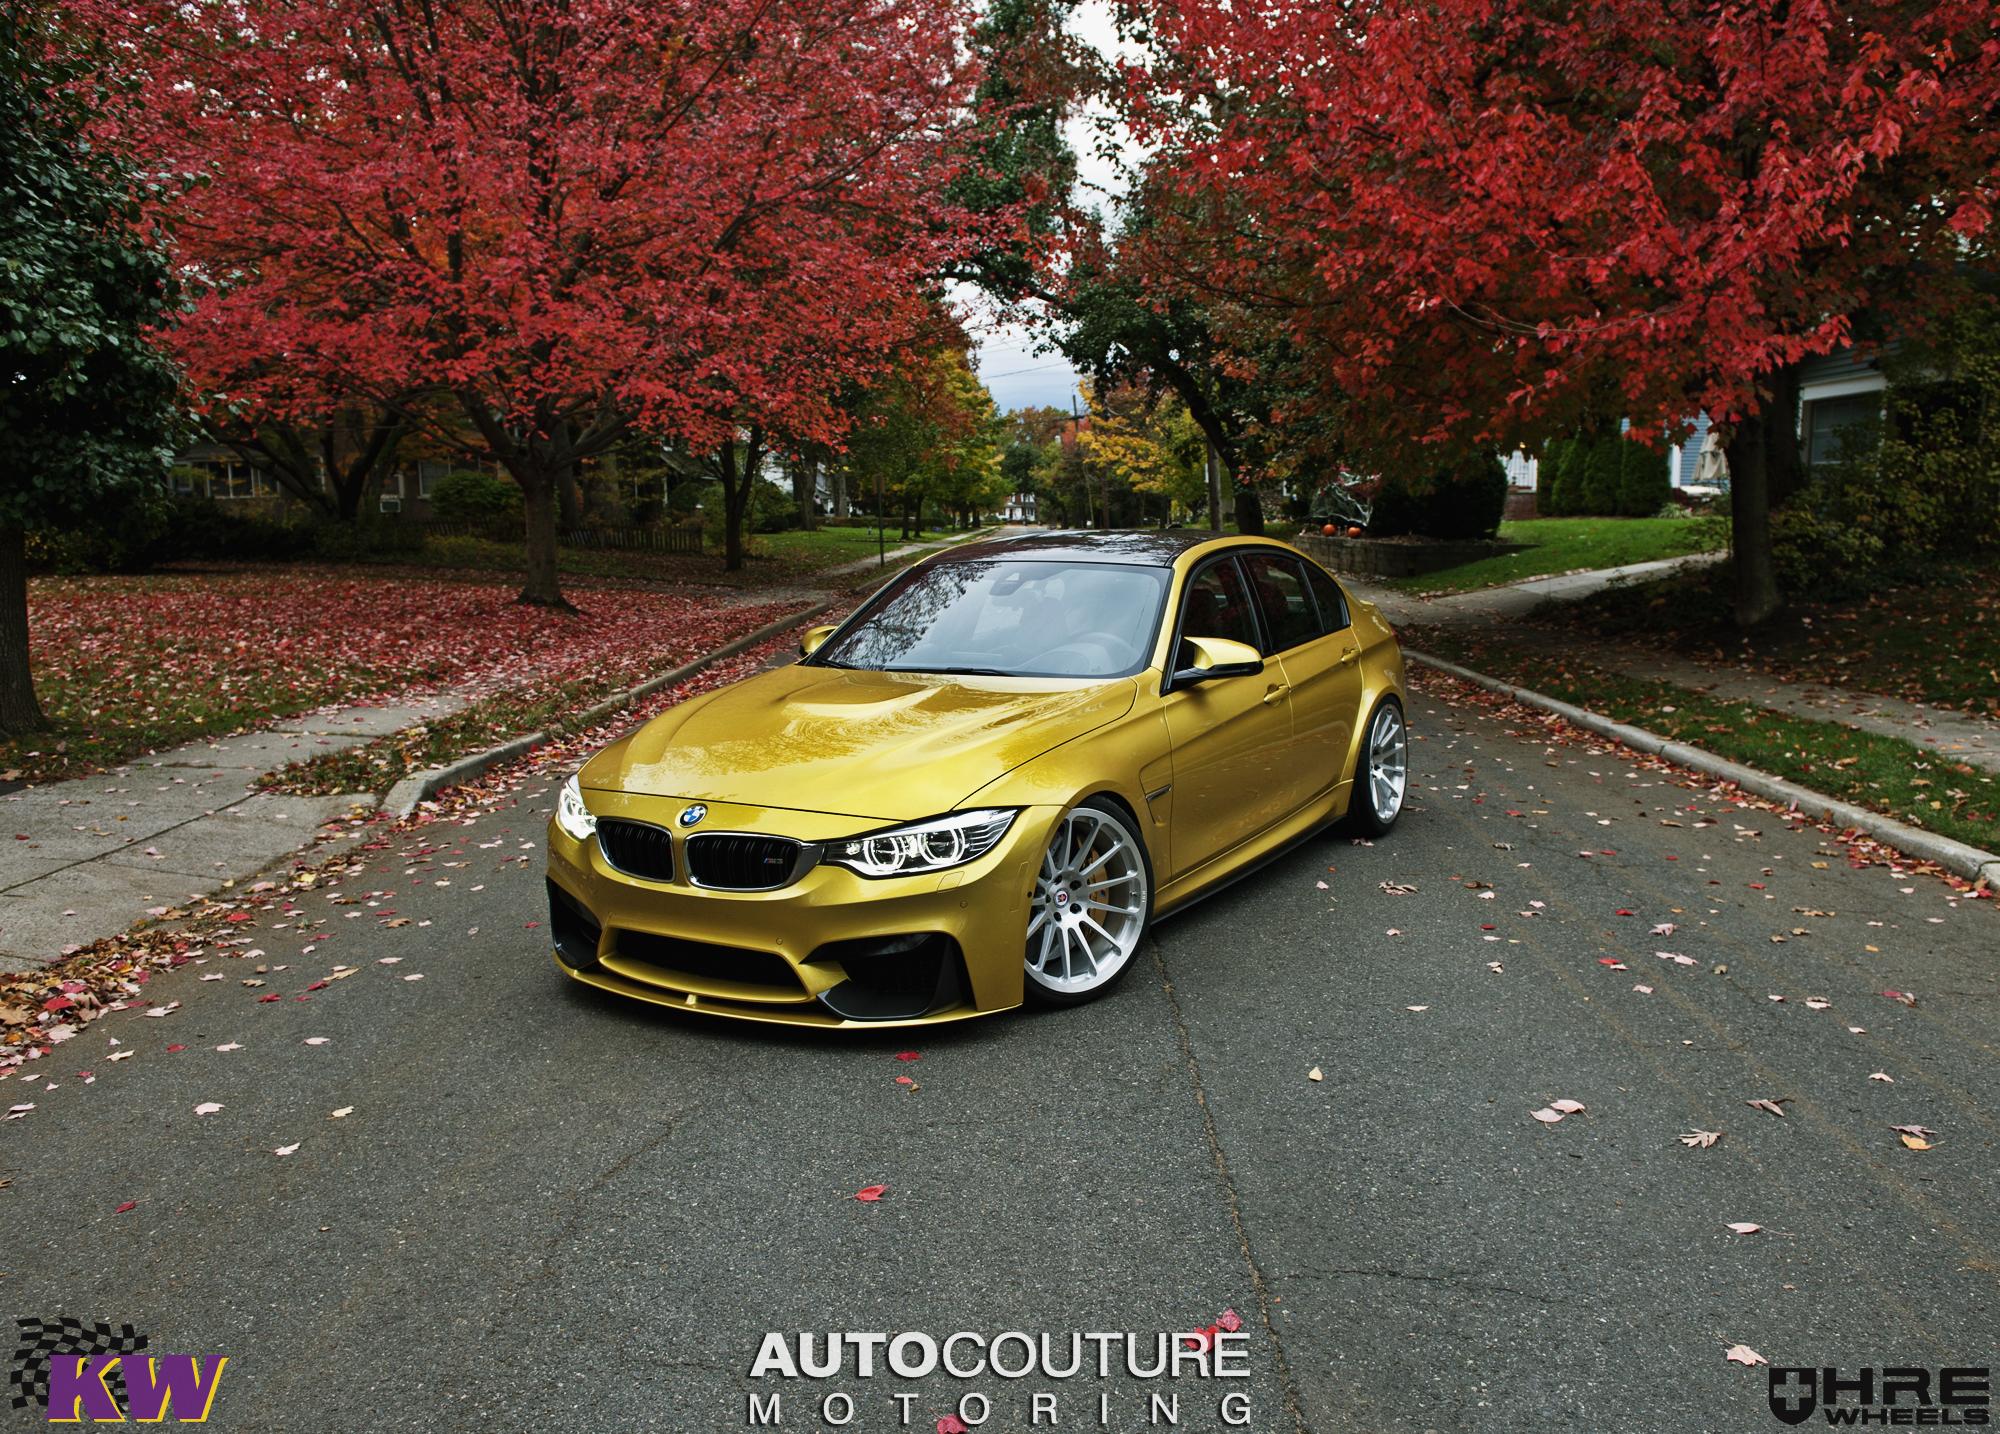 Bmw F80 M3 Shows Its Autumn Colors On Hre Classic Wheels Autoevolution